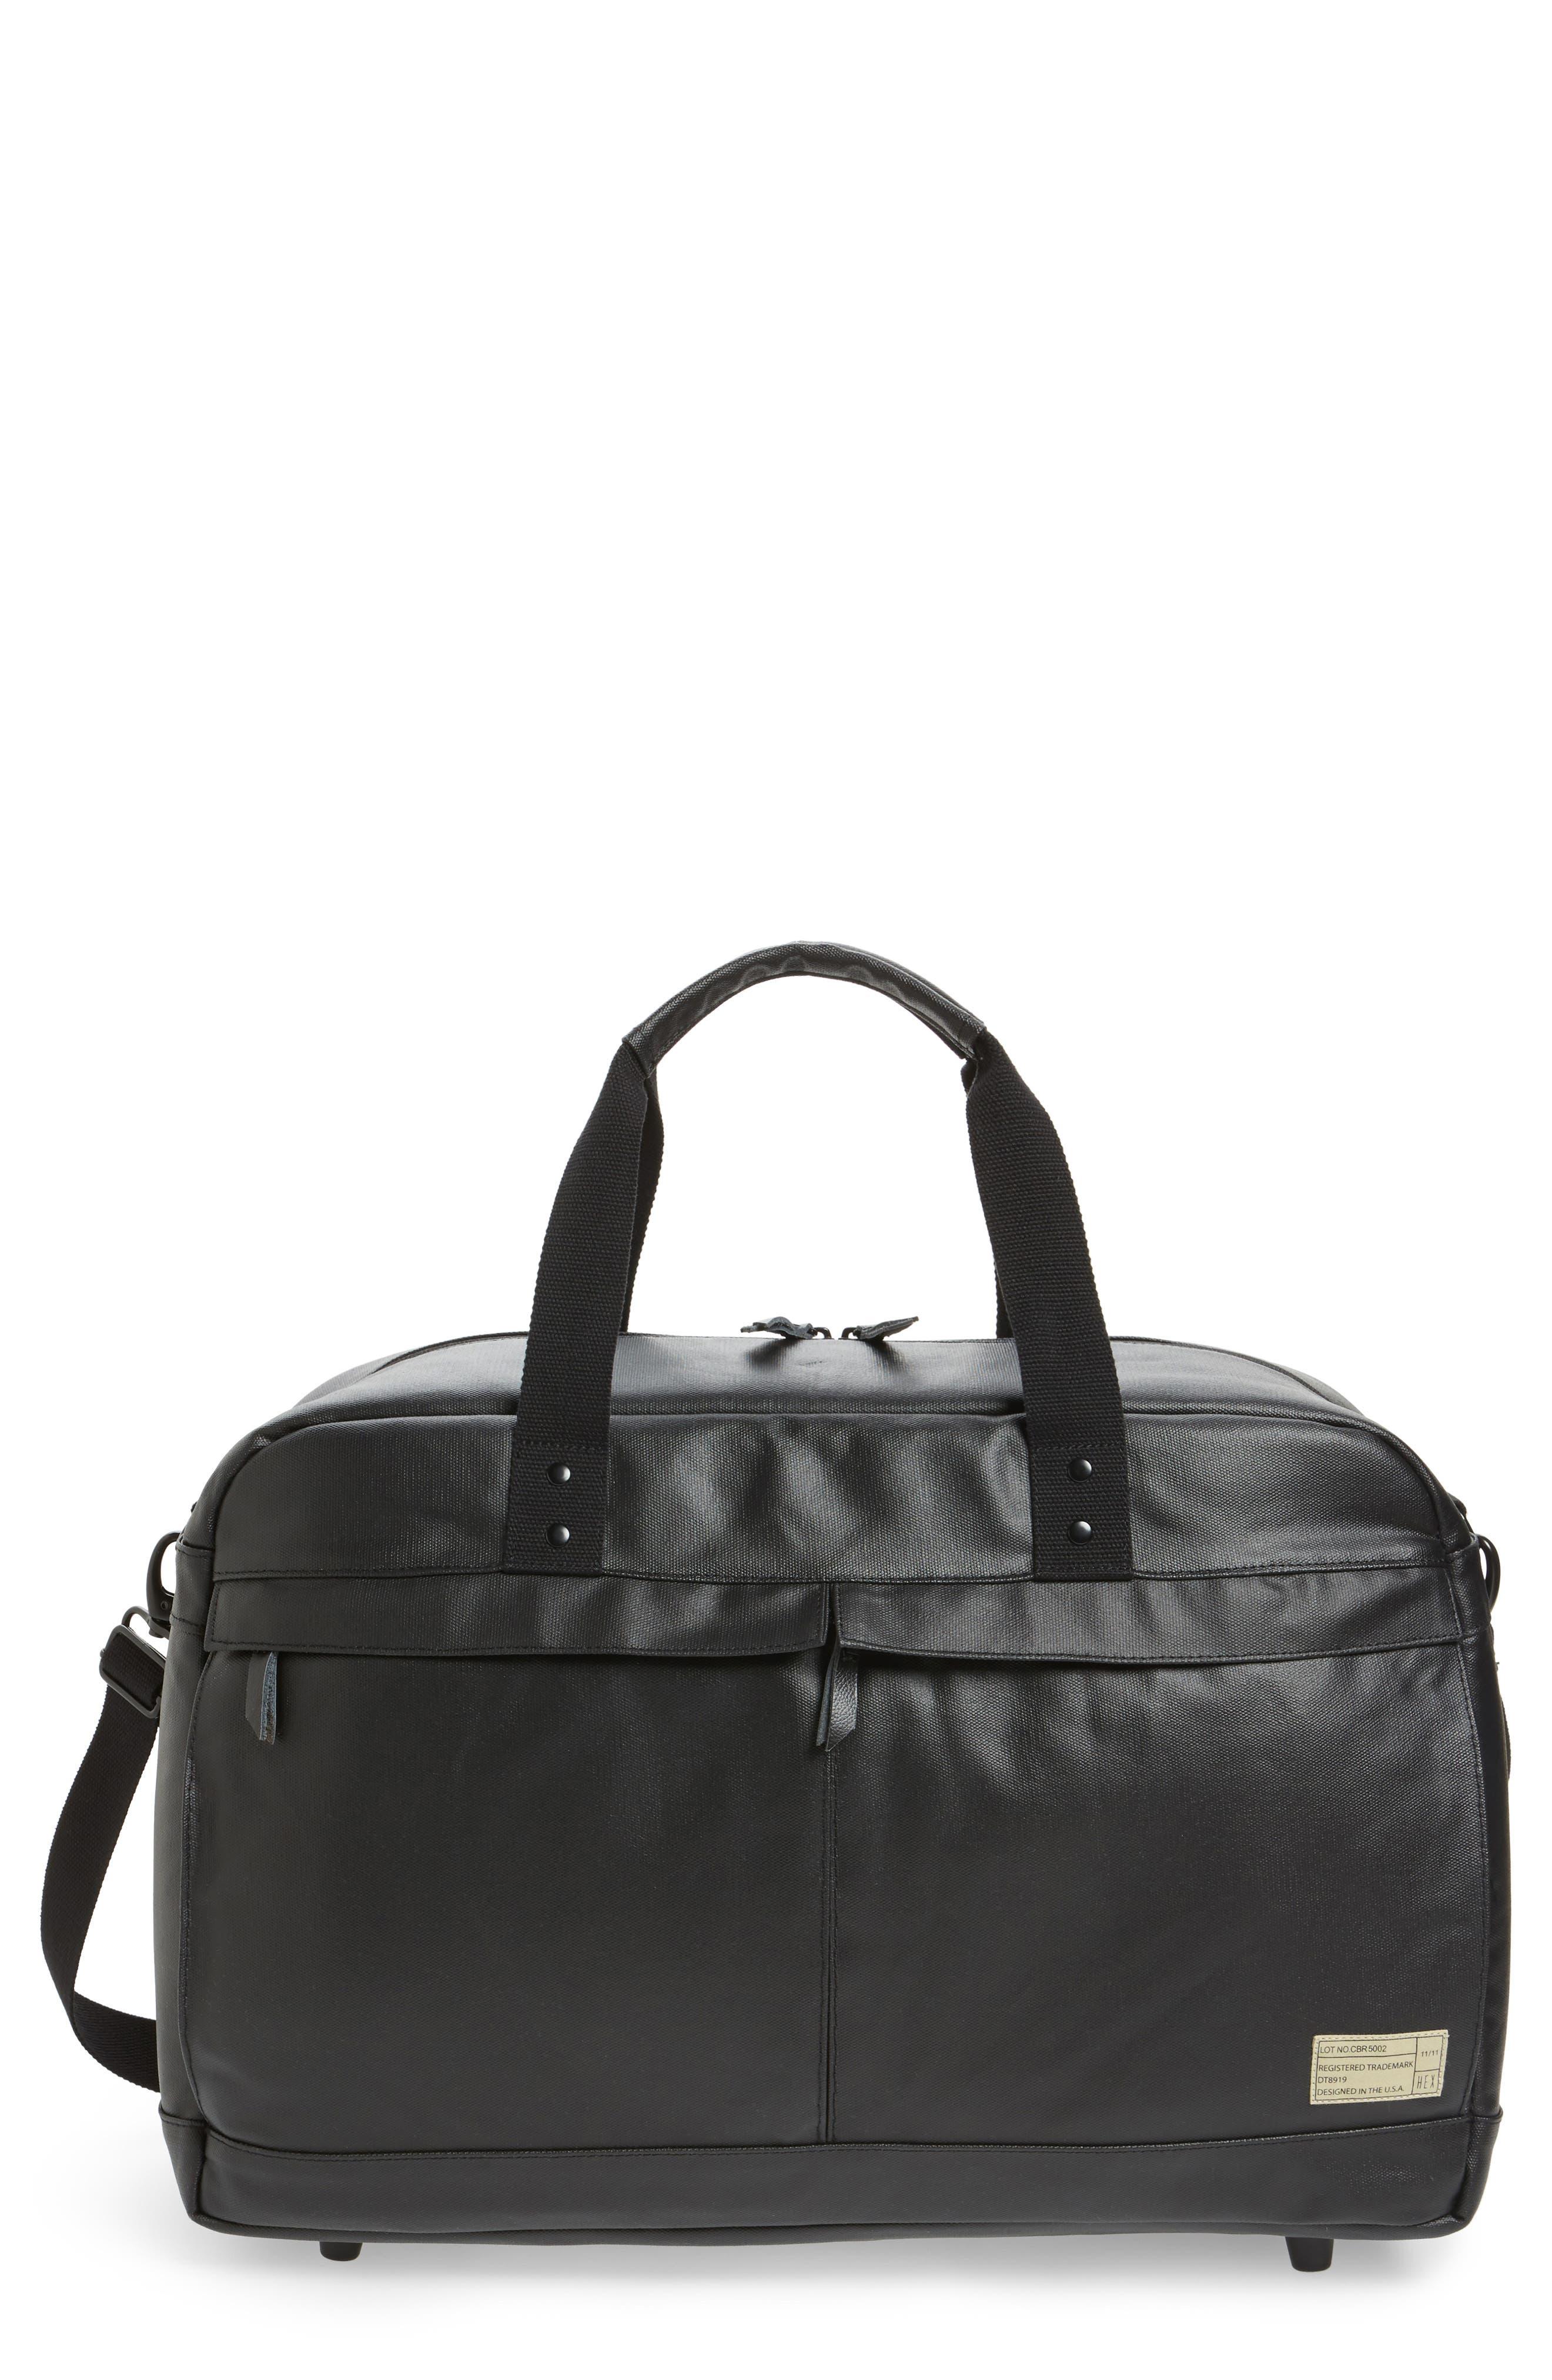 Calibre Duffel Bag,                             Main thumbnail 1, color,                             001